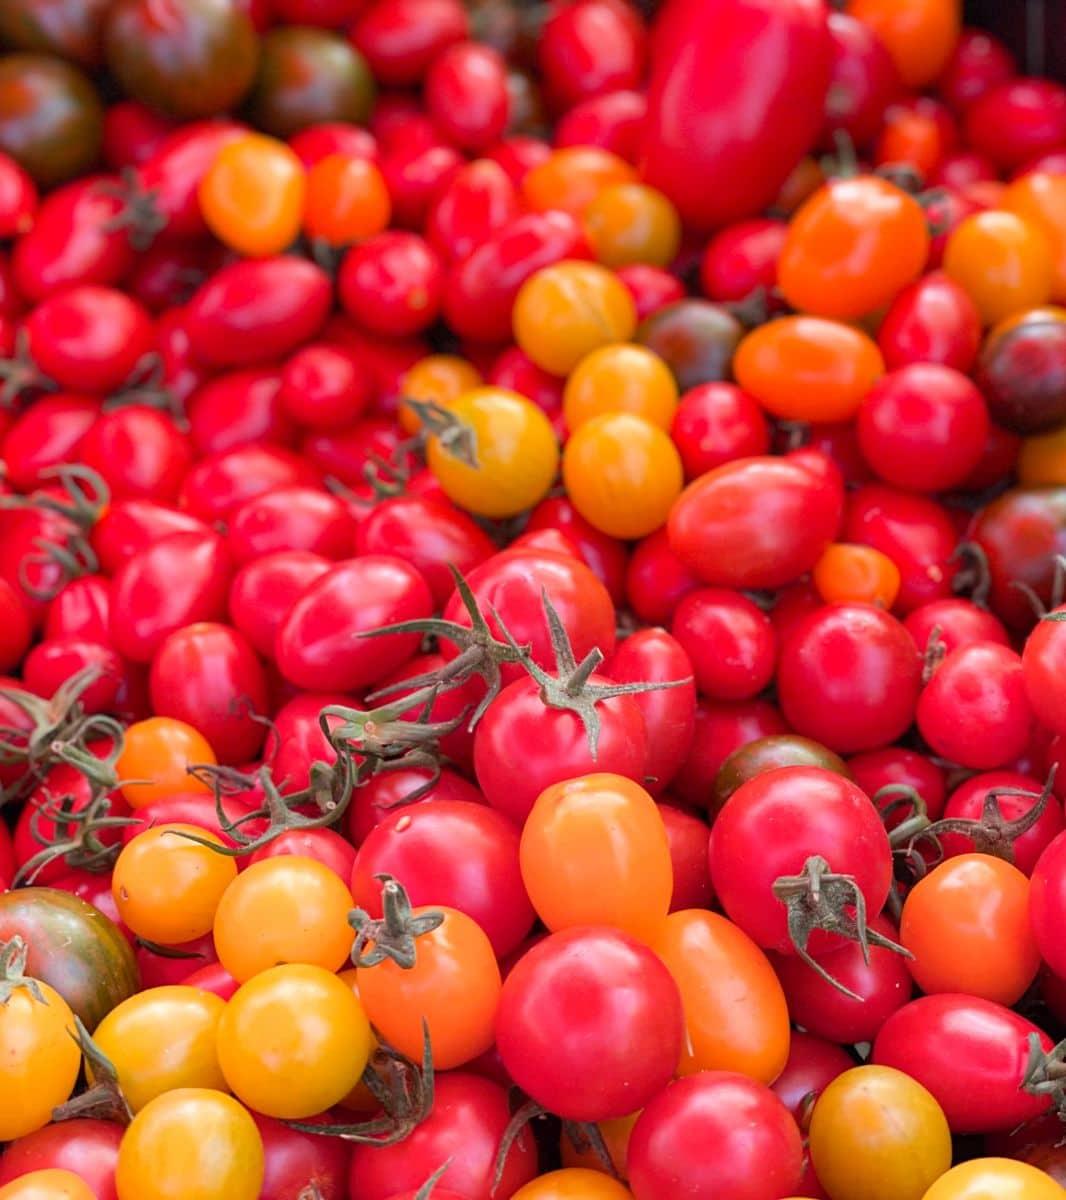 pomidorki koktajlowe mix kolorów